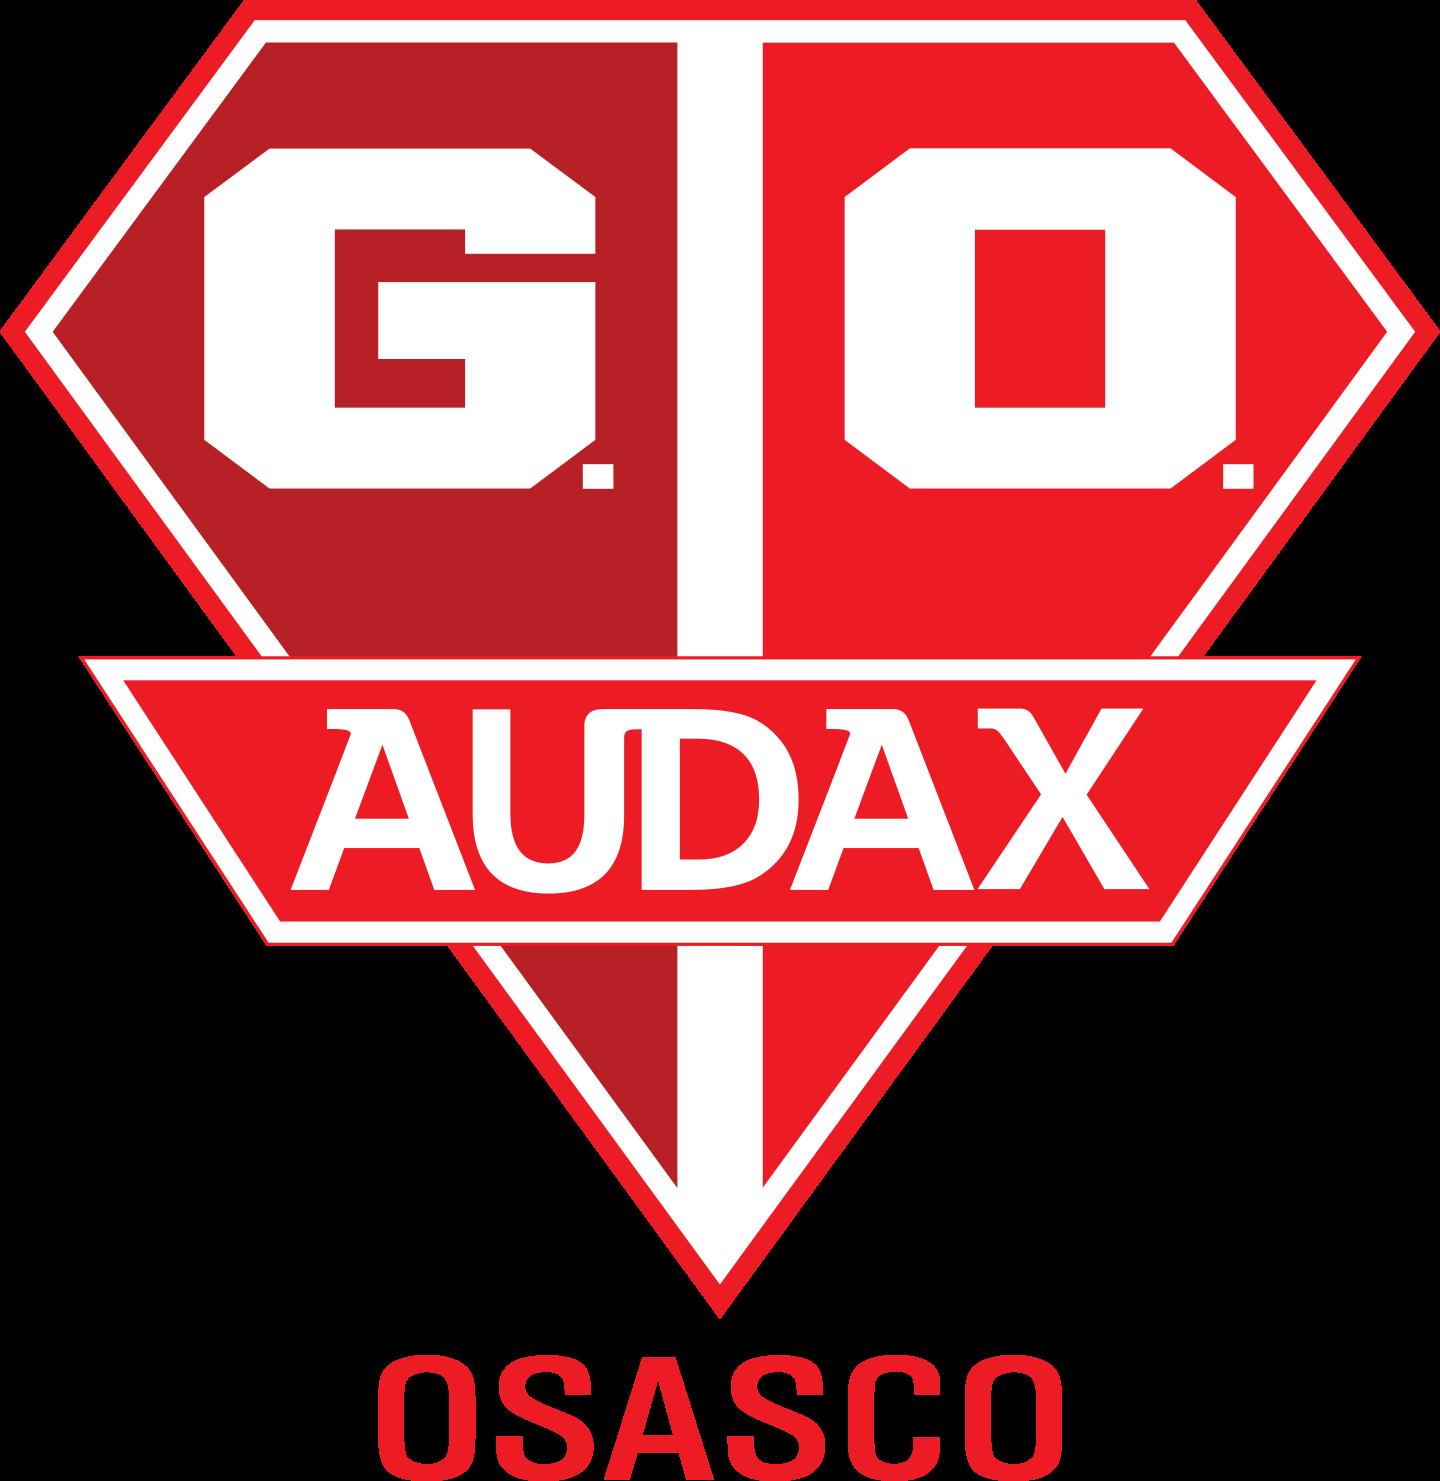 gremio osasco audax logo 3 - Grêmio Osasco Audax Logo